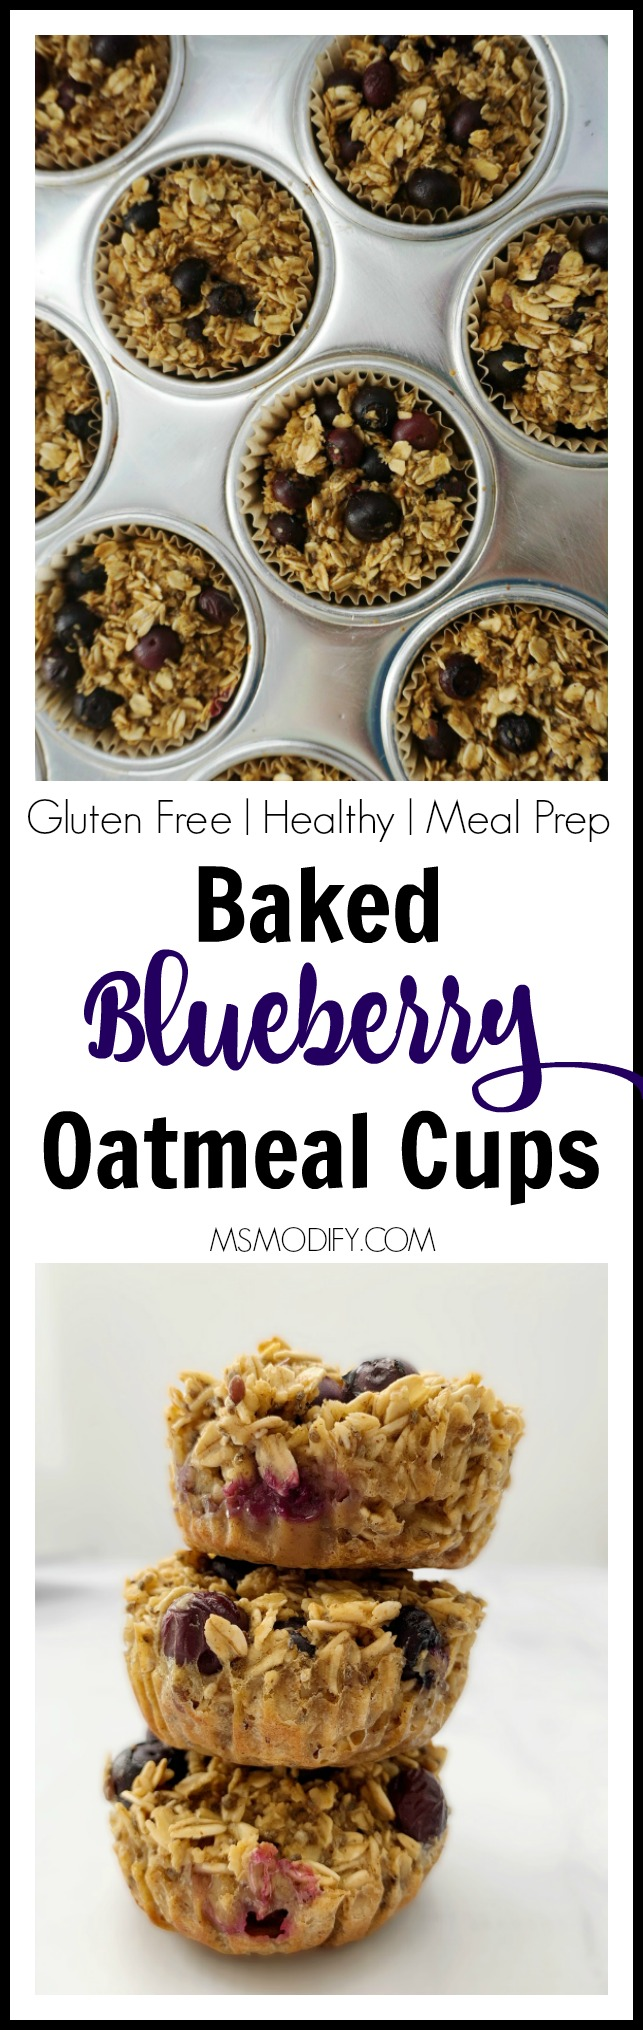 Blueberry Oatmeal CupsBlueberry Oatmeal Cups